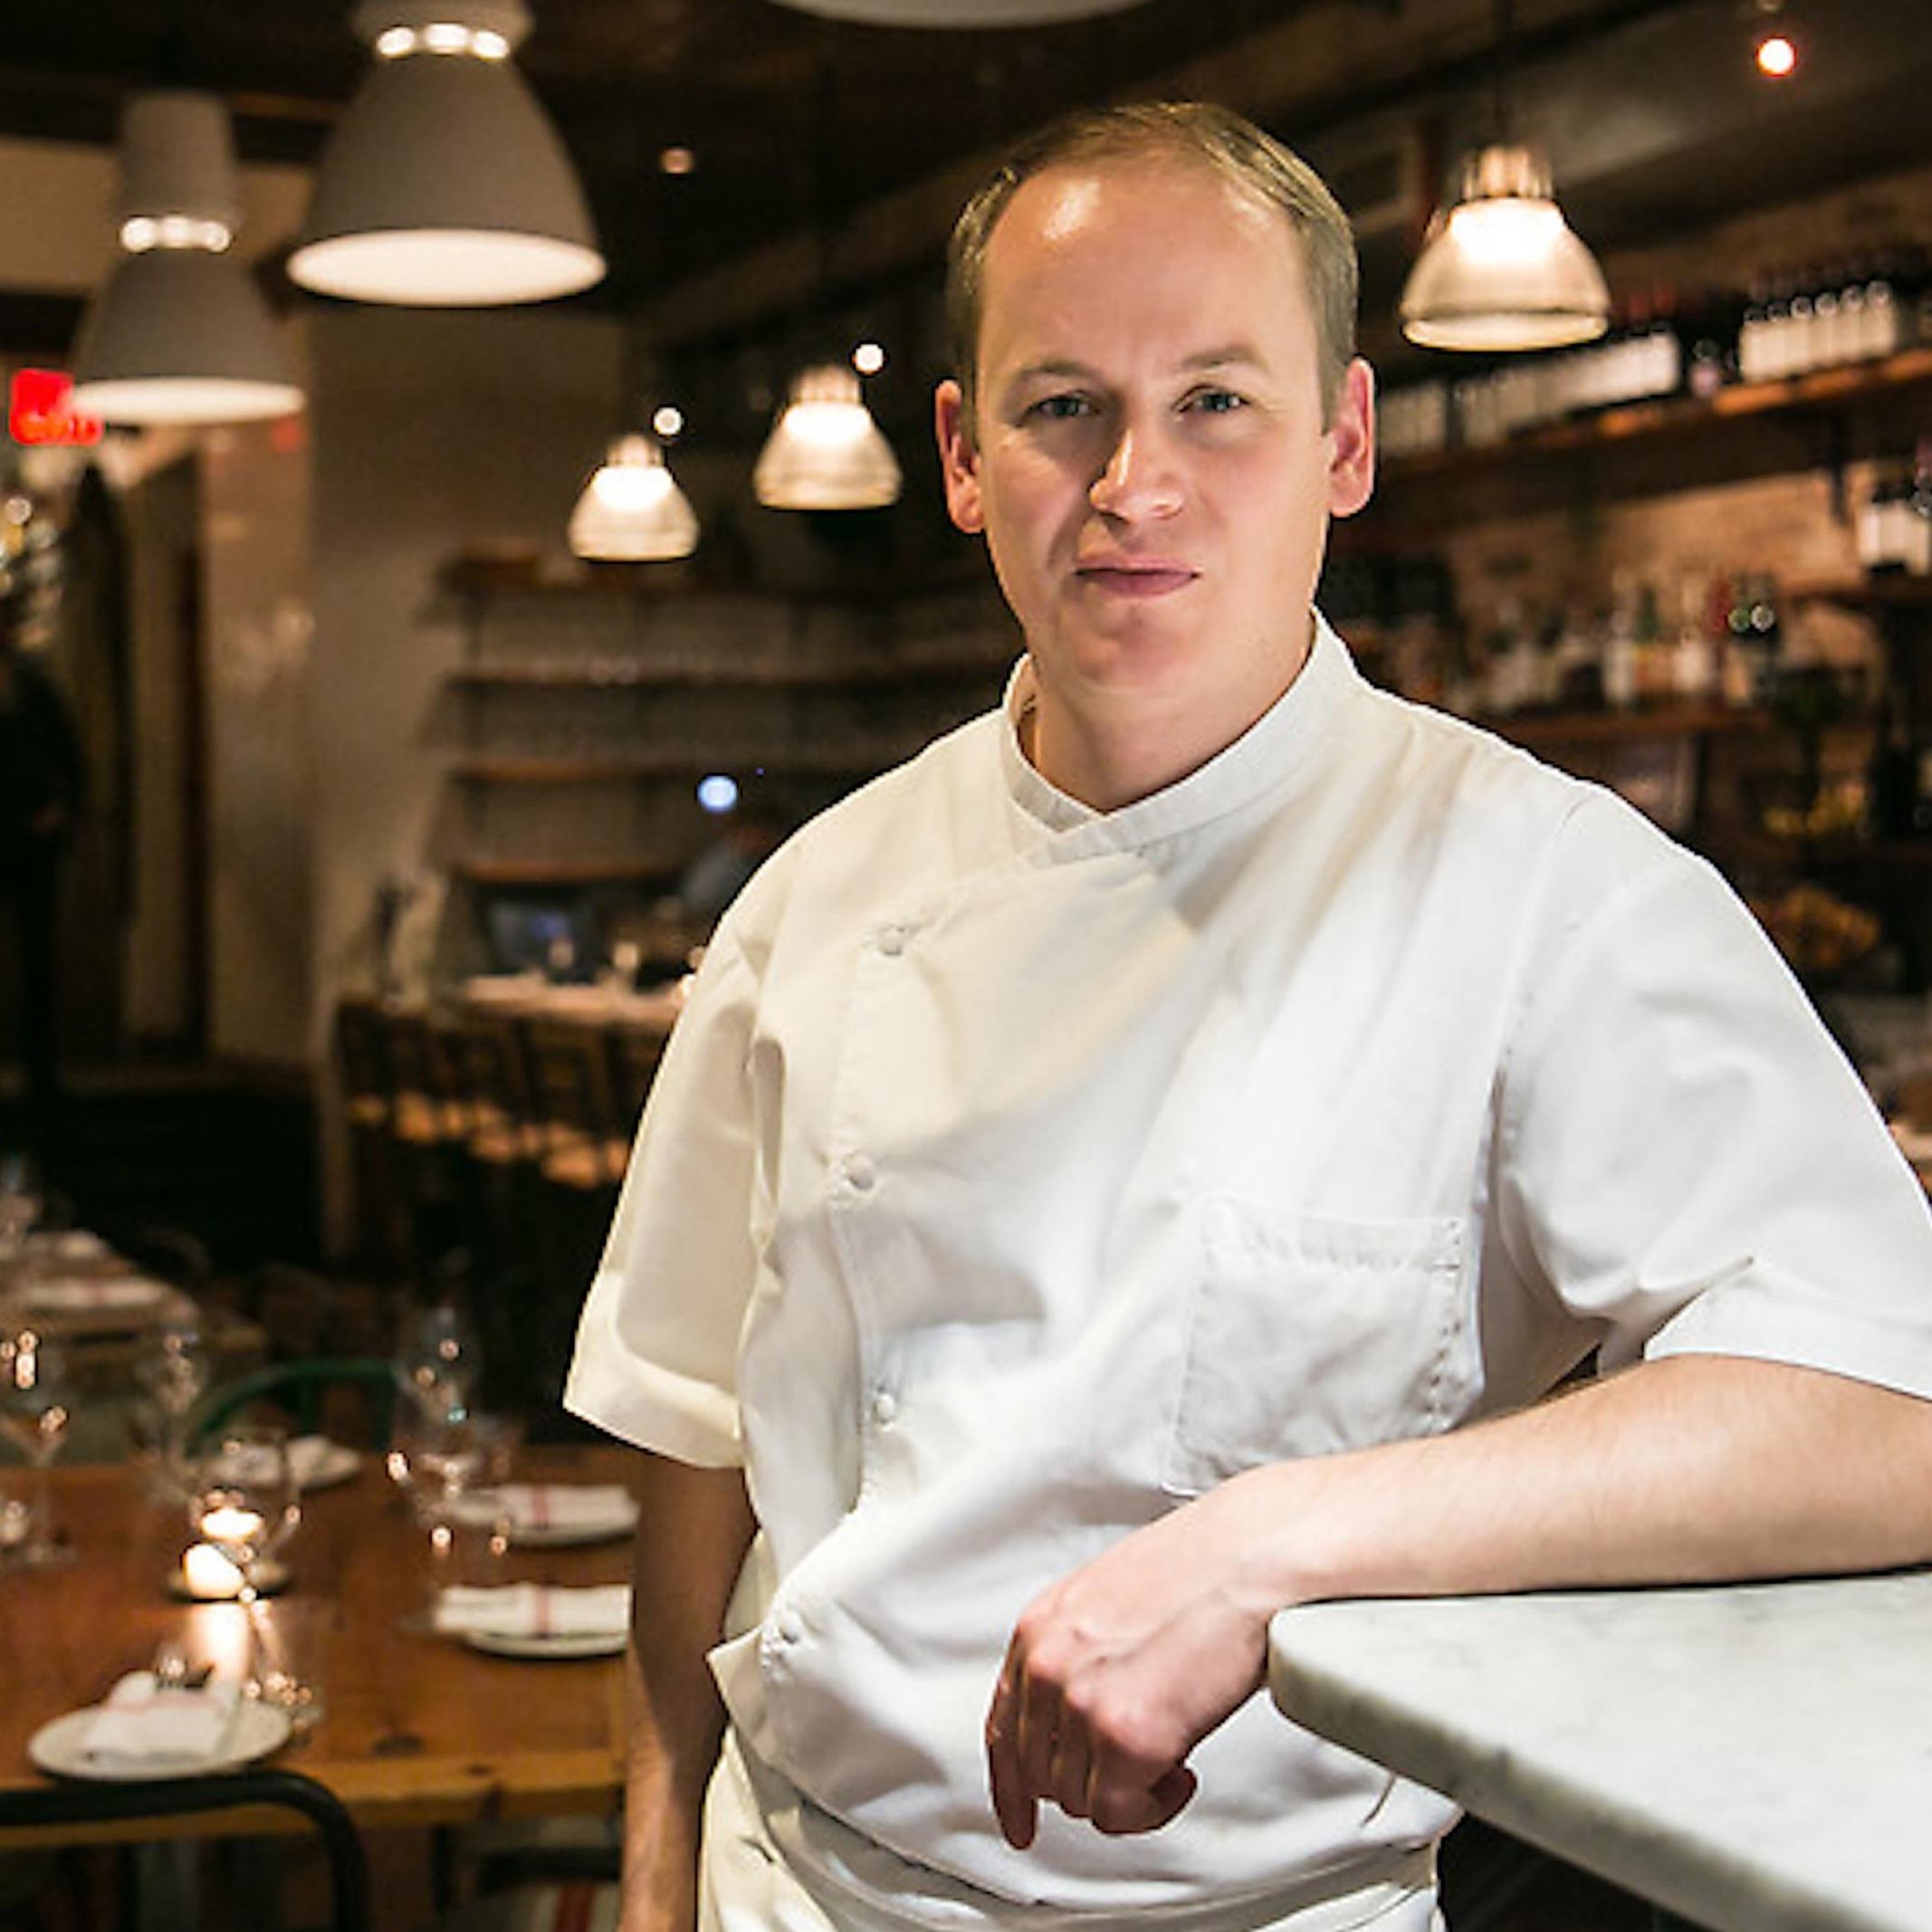 Chef_Cafe_Clover.jpg